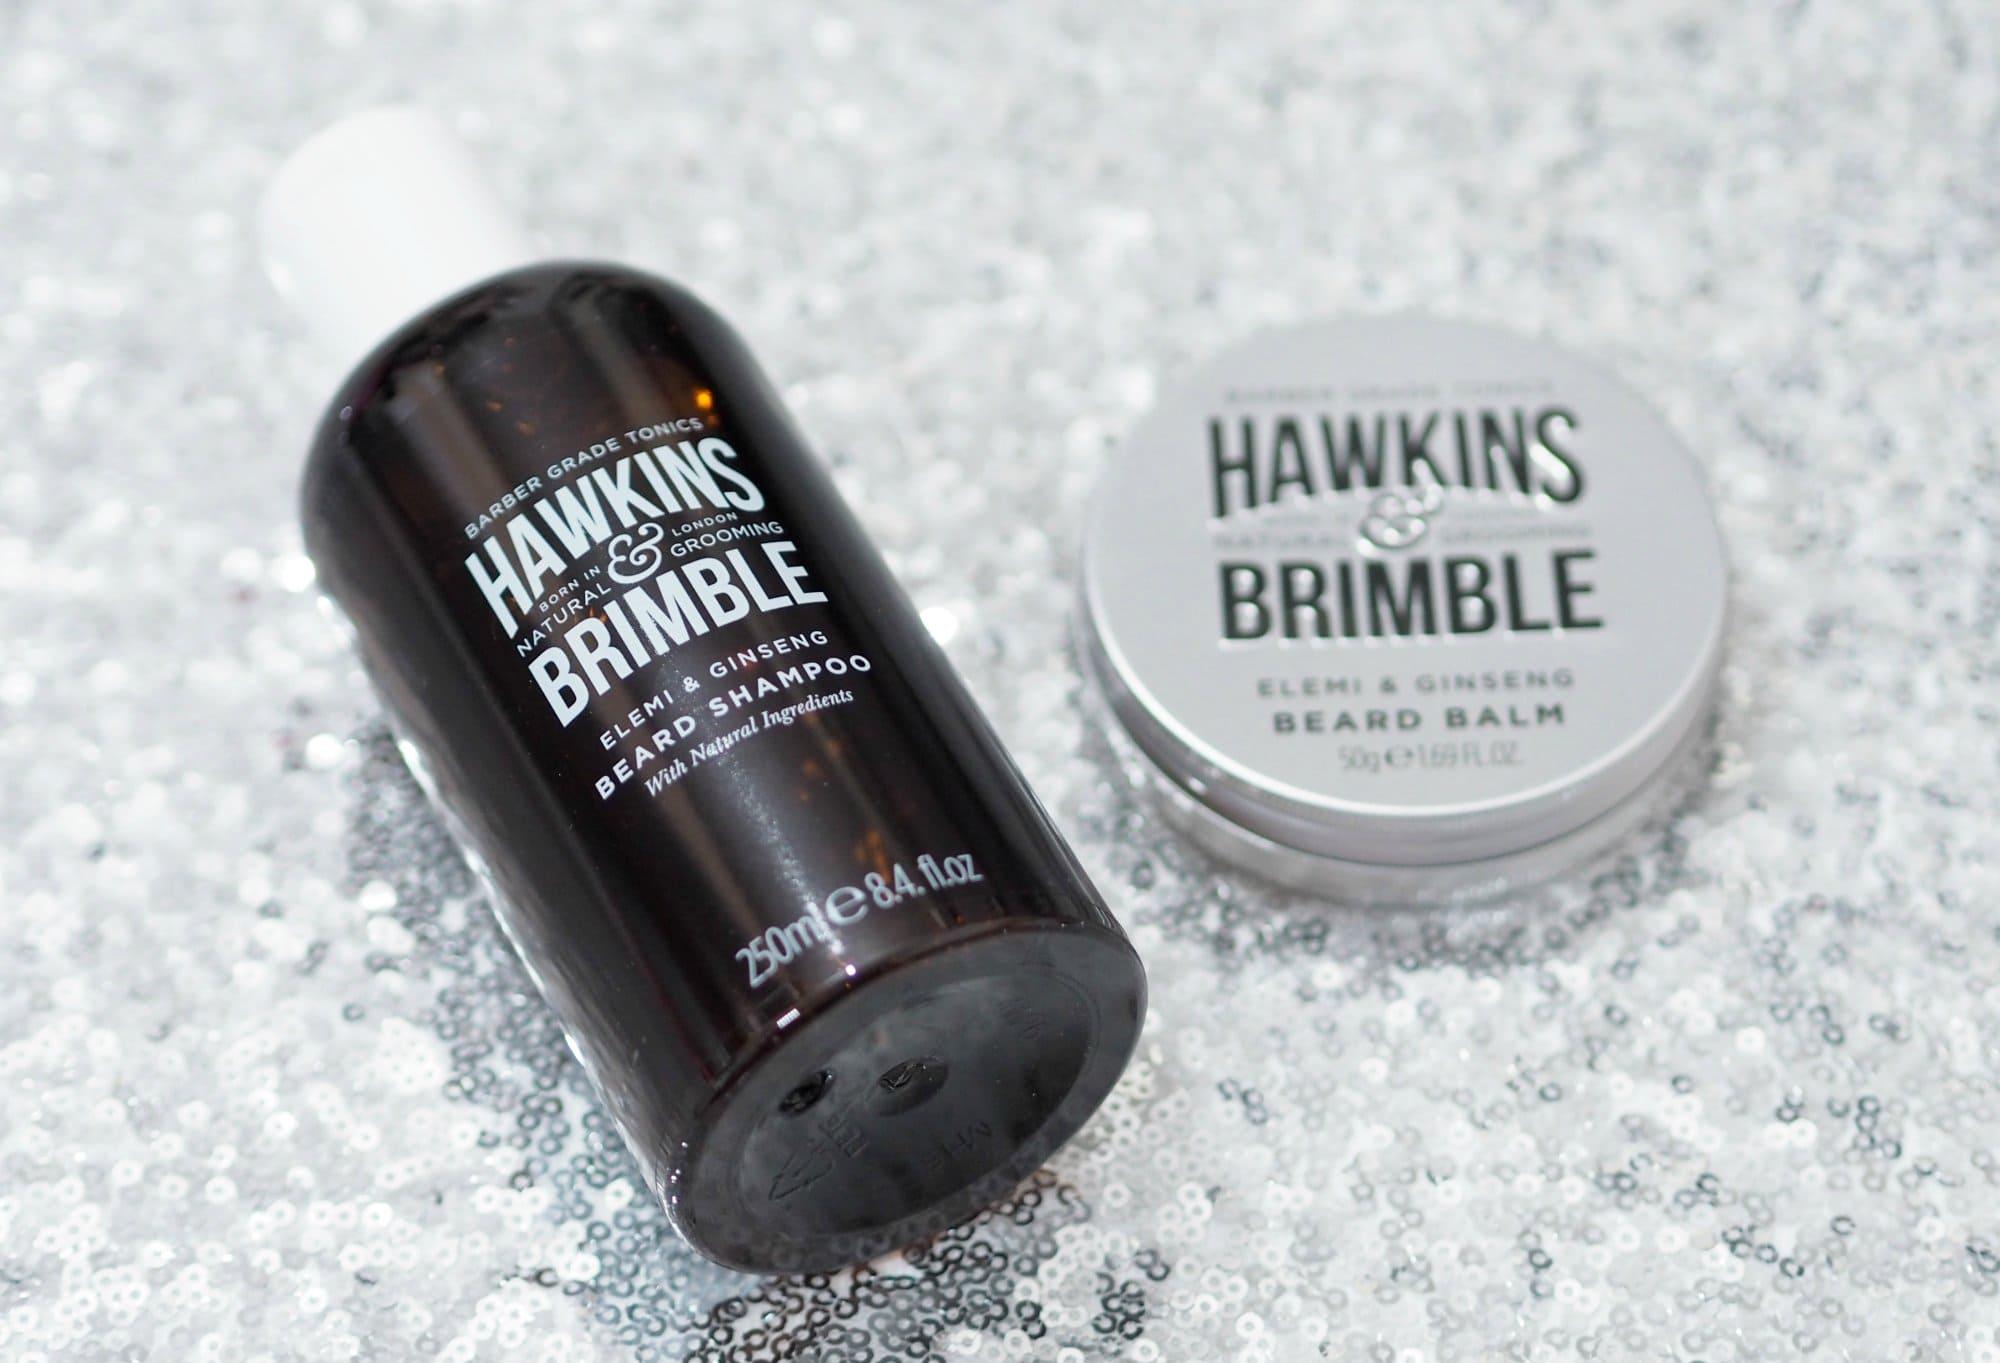 Hawkins & Brimble Grooming Gift Sets